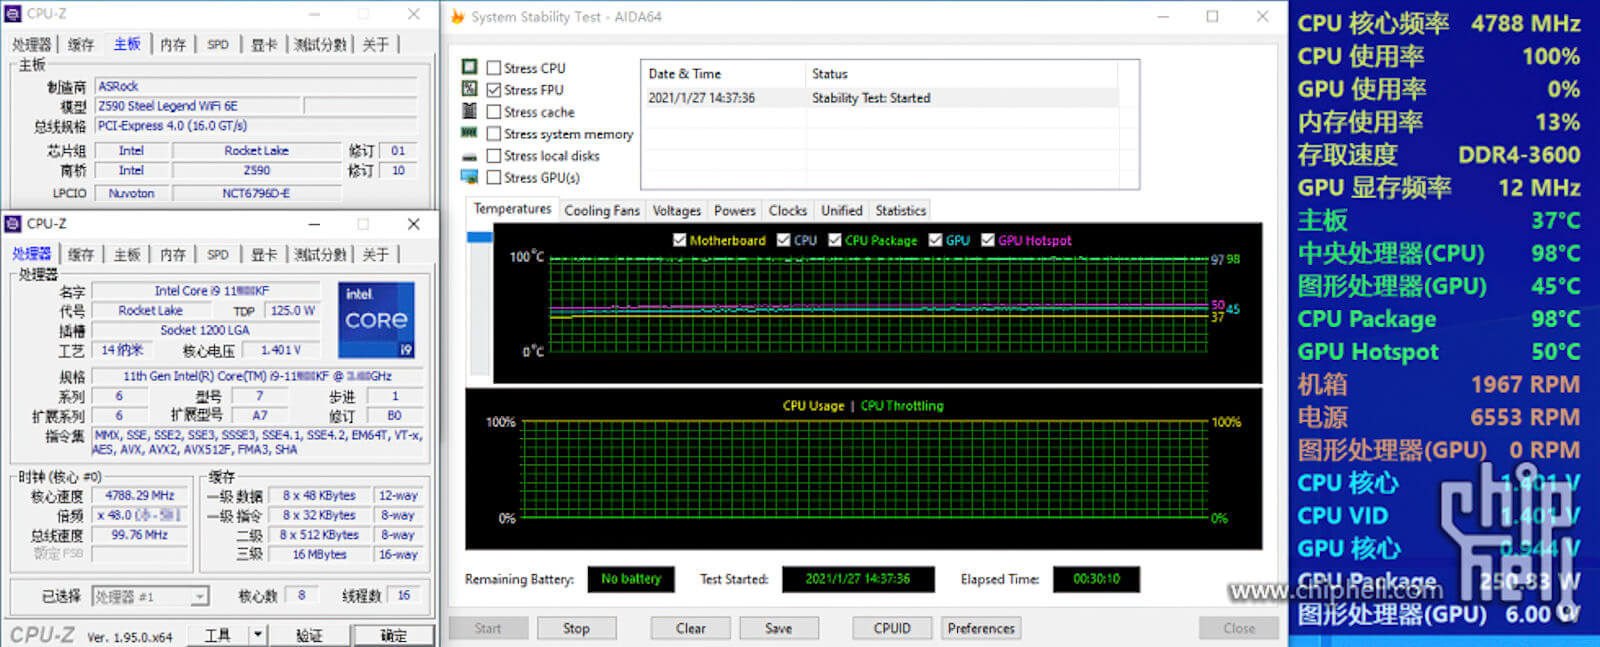 Intel Core i9-11900KF CPU 98c temperature-1